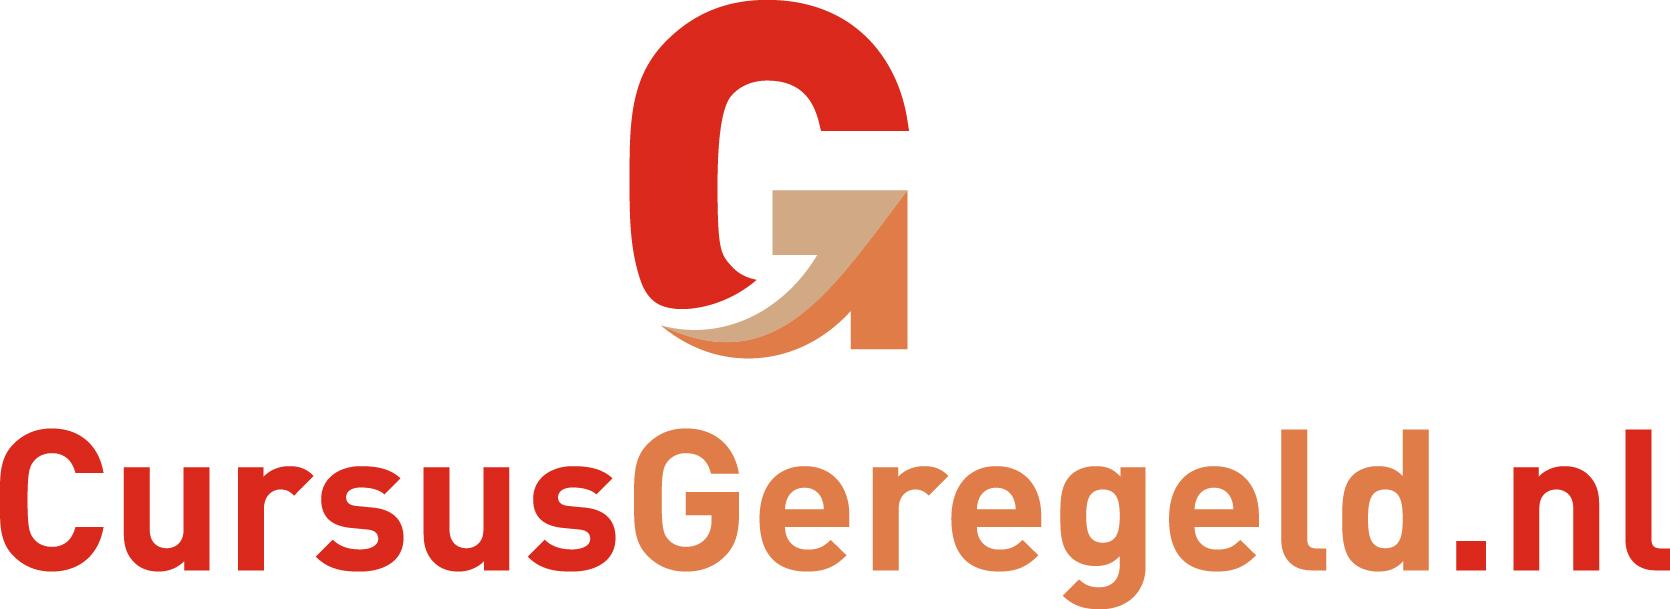 Cursusgeregeld.nl logo